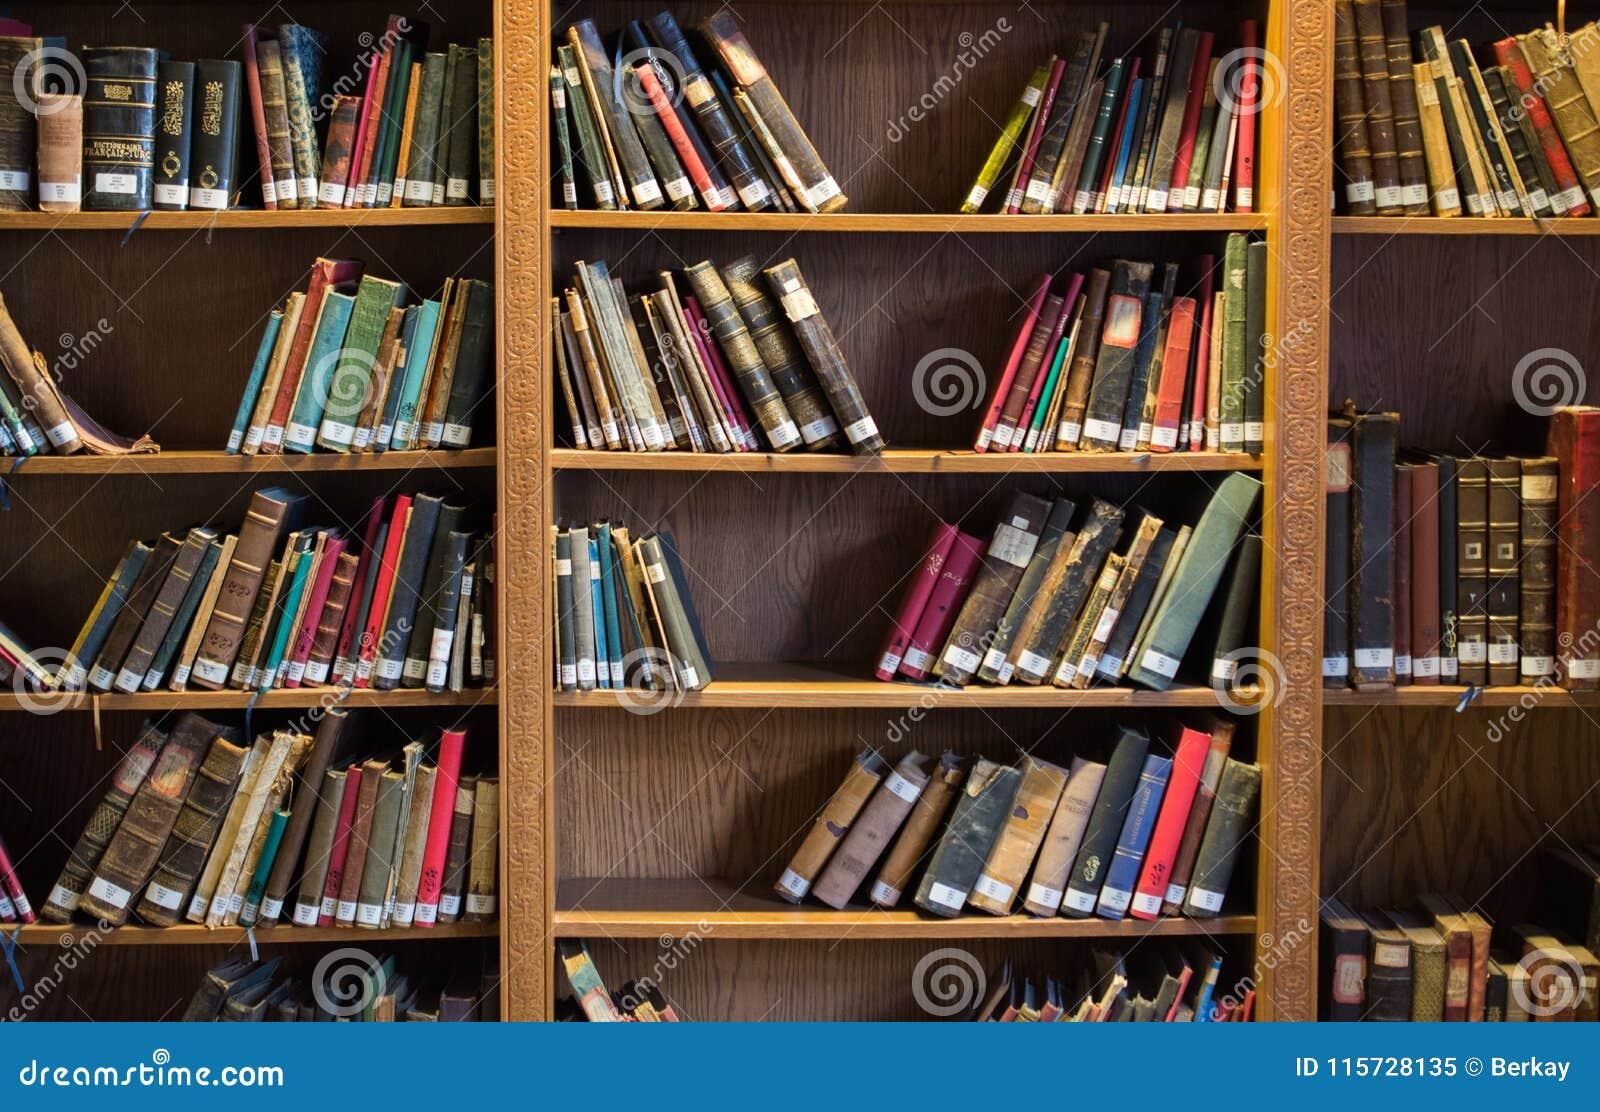 Download Bookshelf With Turkish Ottoman Handwriting Books Stock Image